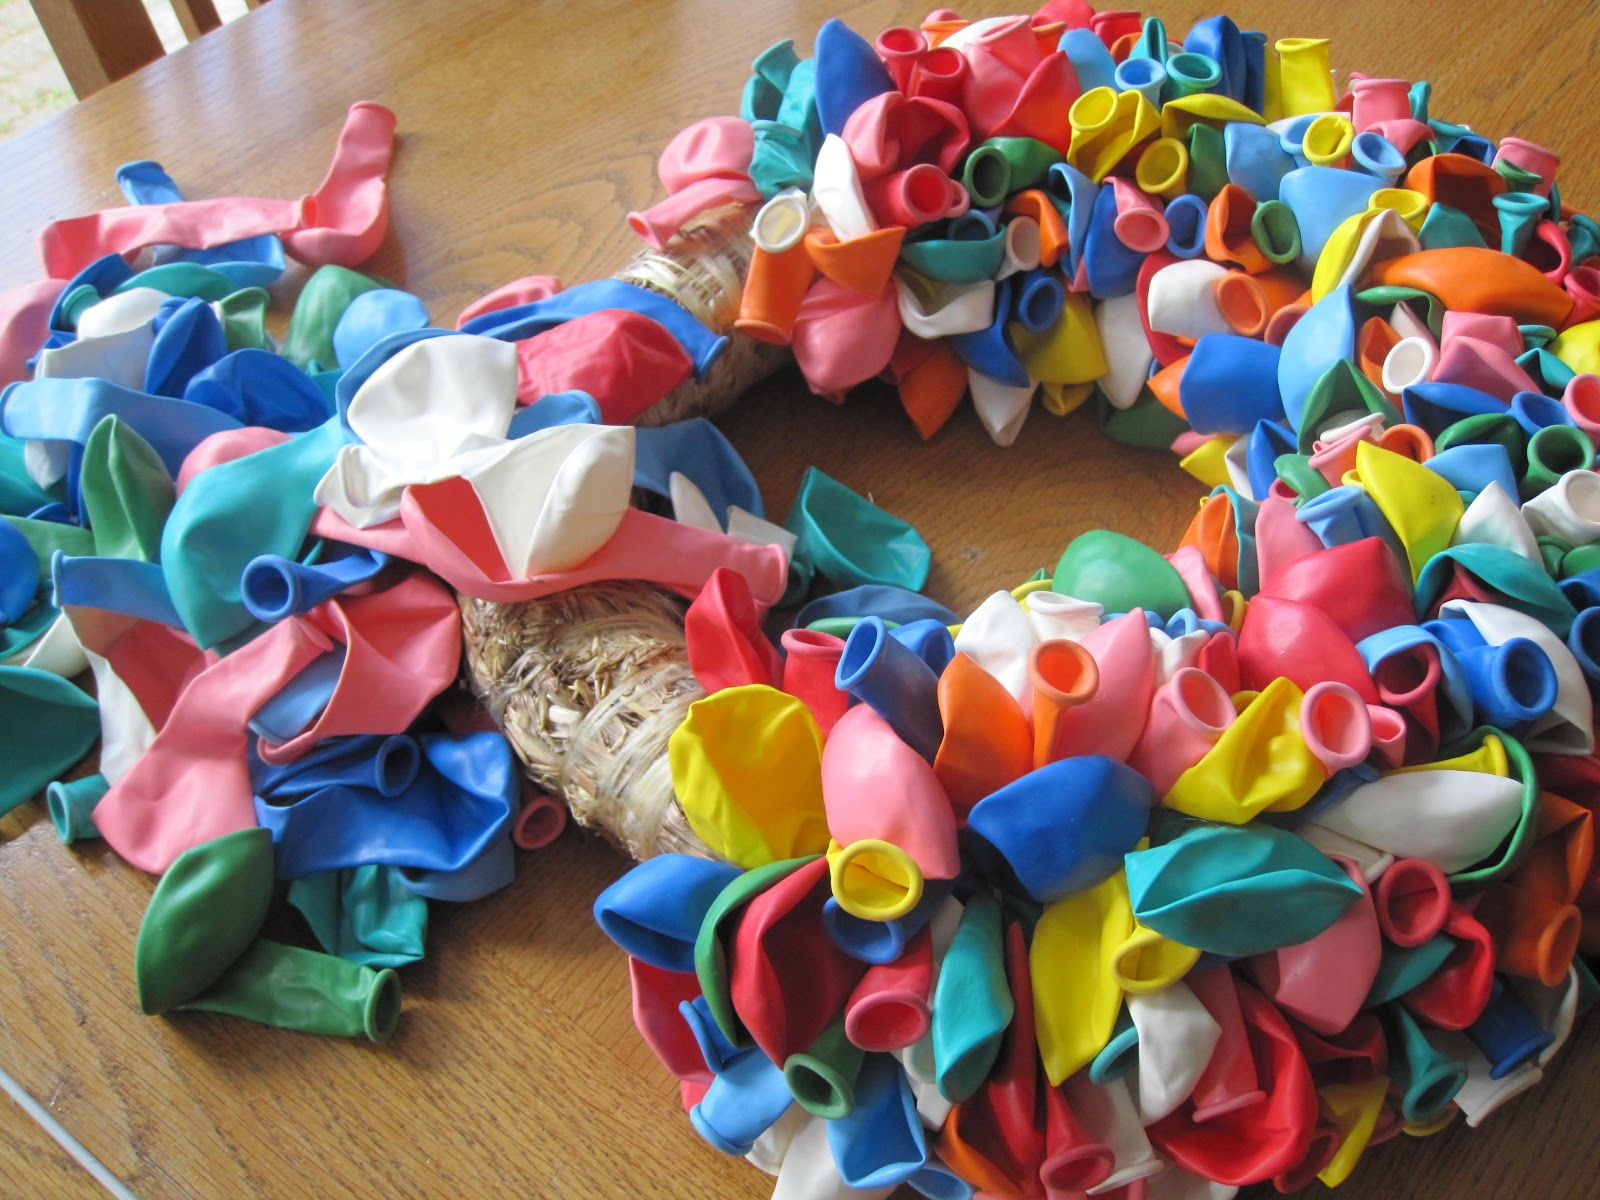 Freubelientje ballonnen ballonnen en nog eens ballonnen - Ideeen van binnenkomst ...